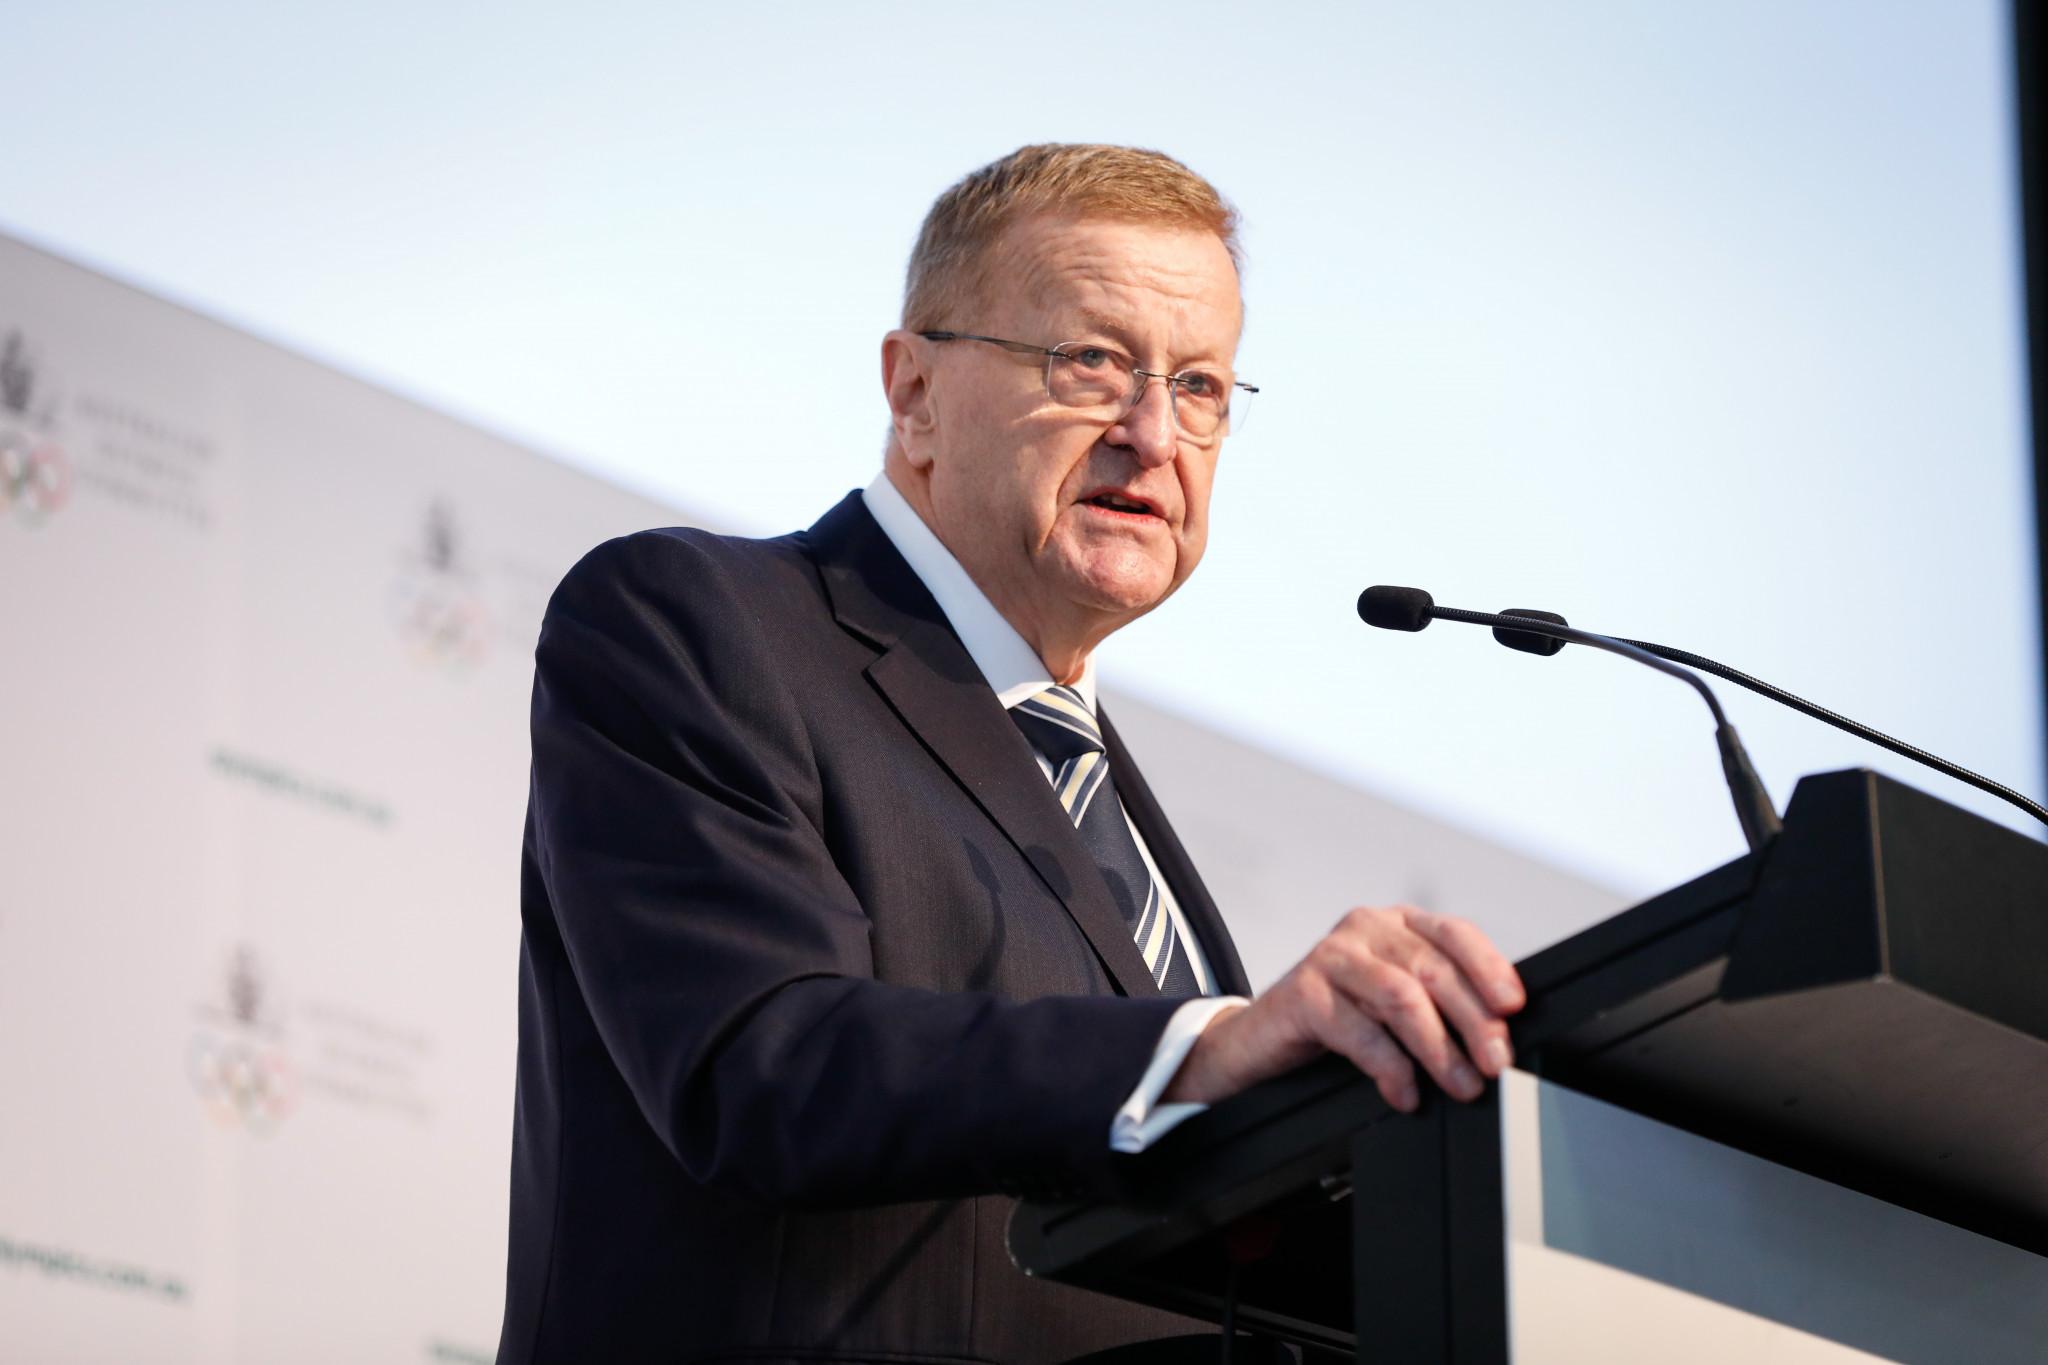 Coates says Brisbane 2032 on last lap as IOC starts due diligence prior to award